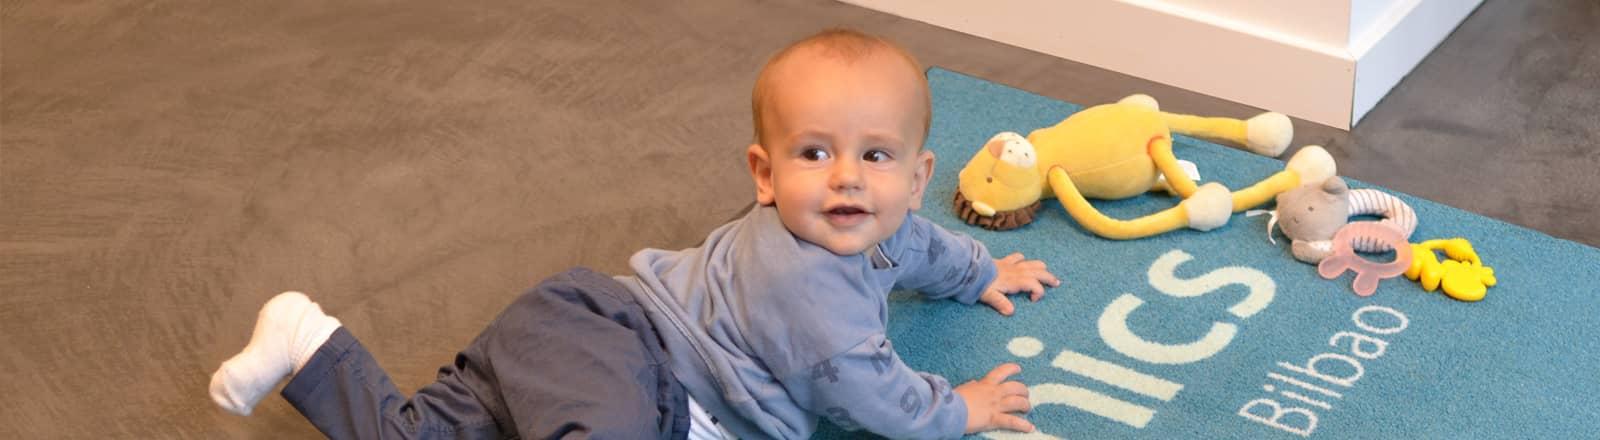 osteopatía infantil - osteopathy - fisioclinics bilbao